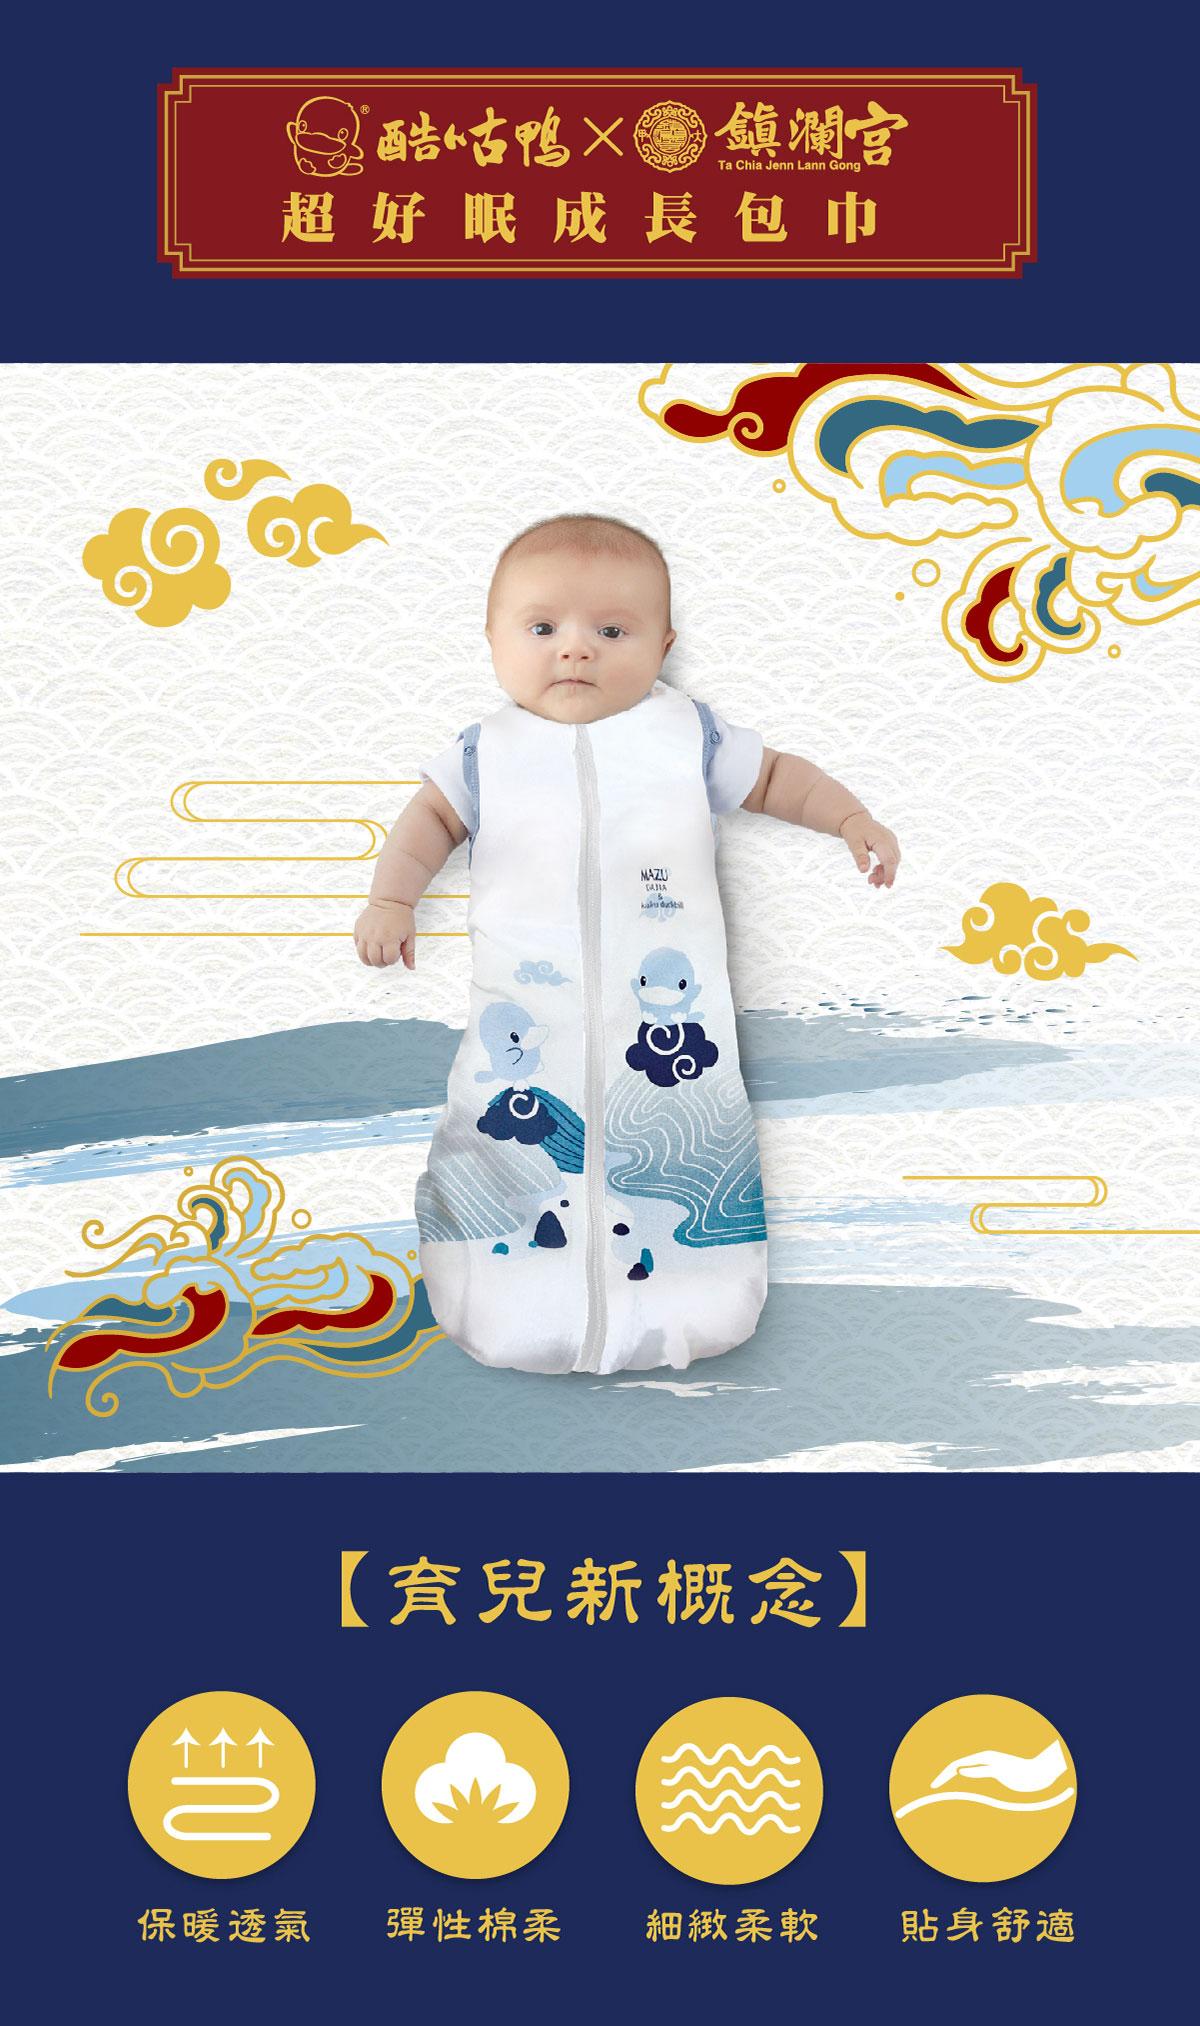 proimages/BeddingSeries/Blankets-Comforter/2542/大甲媽成長包巾-EDM-04.jpg